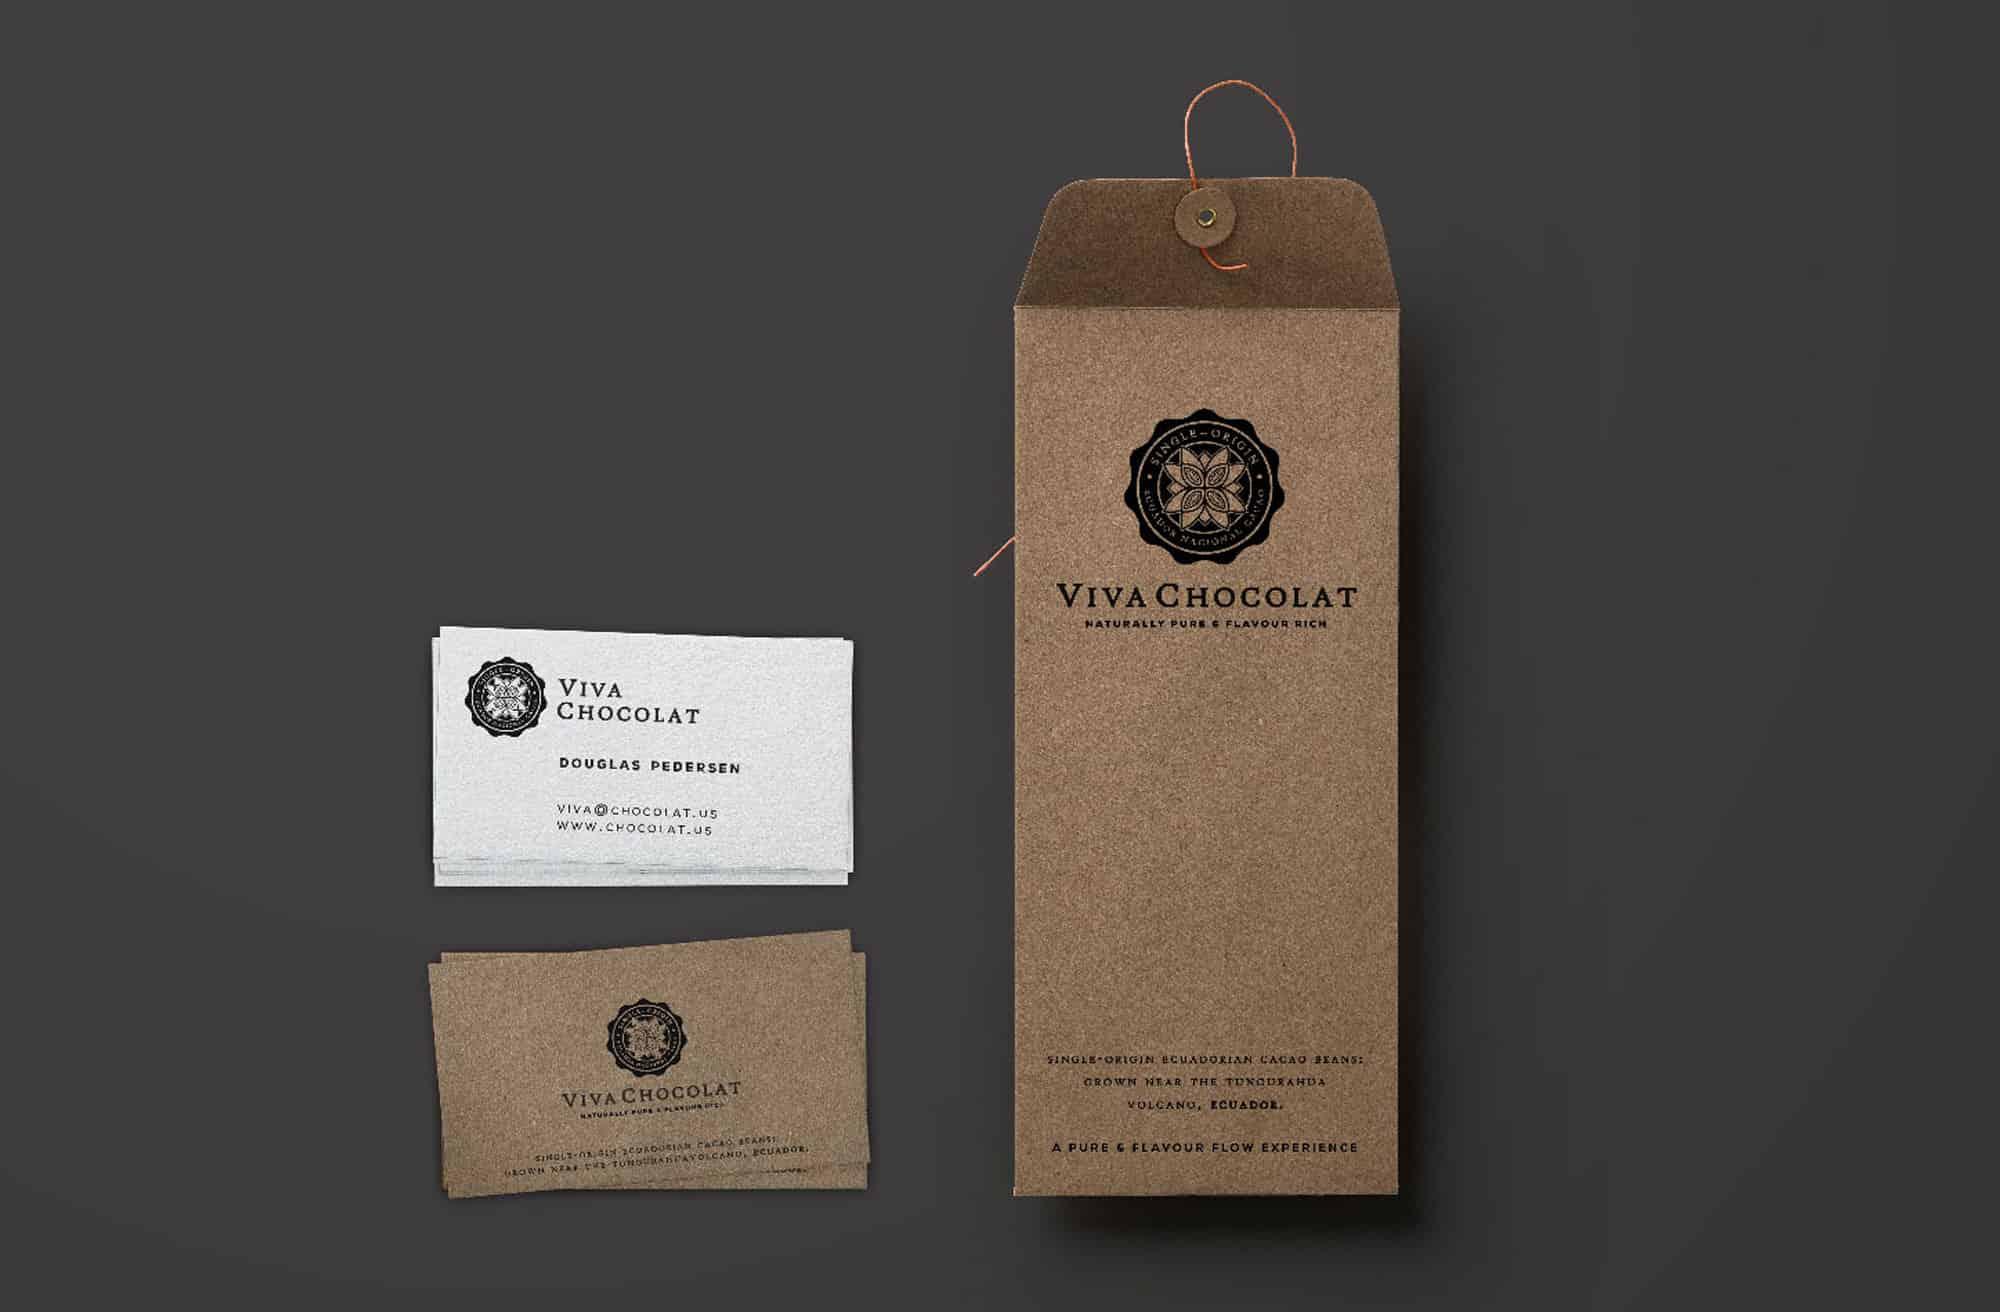 Viva Chocolat Logo & Couverture chocolate Brand Identity Designed by The Logo Smith